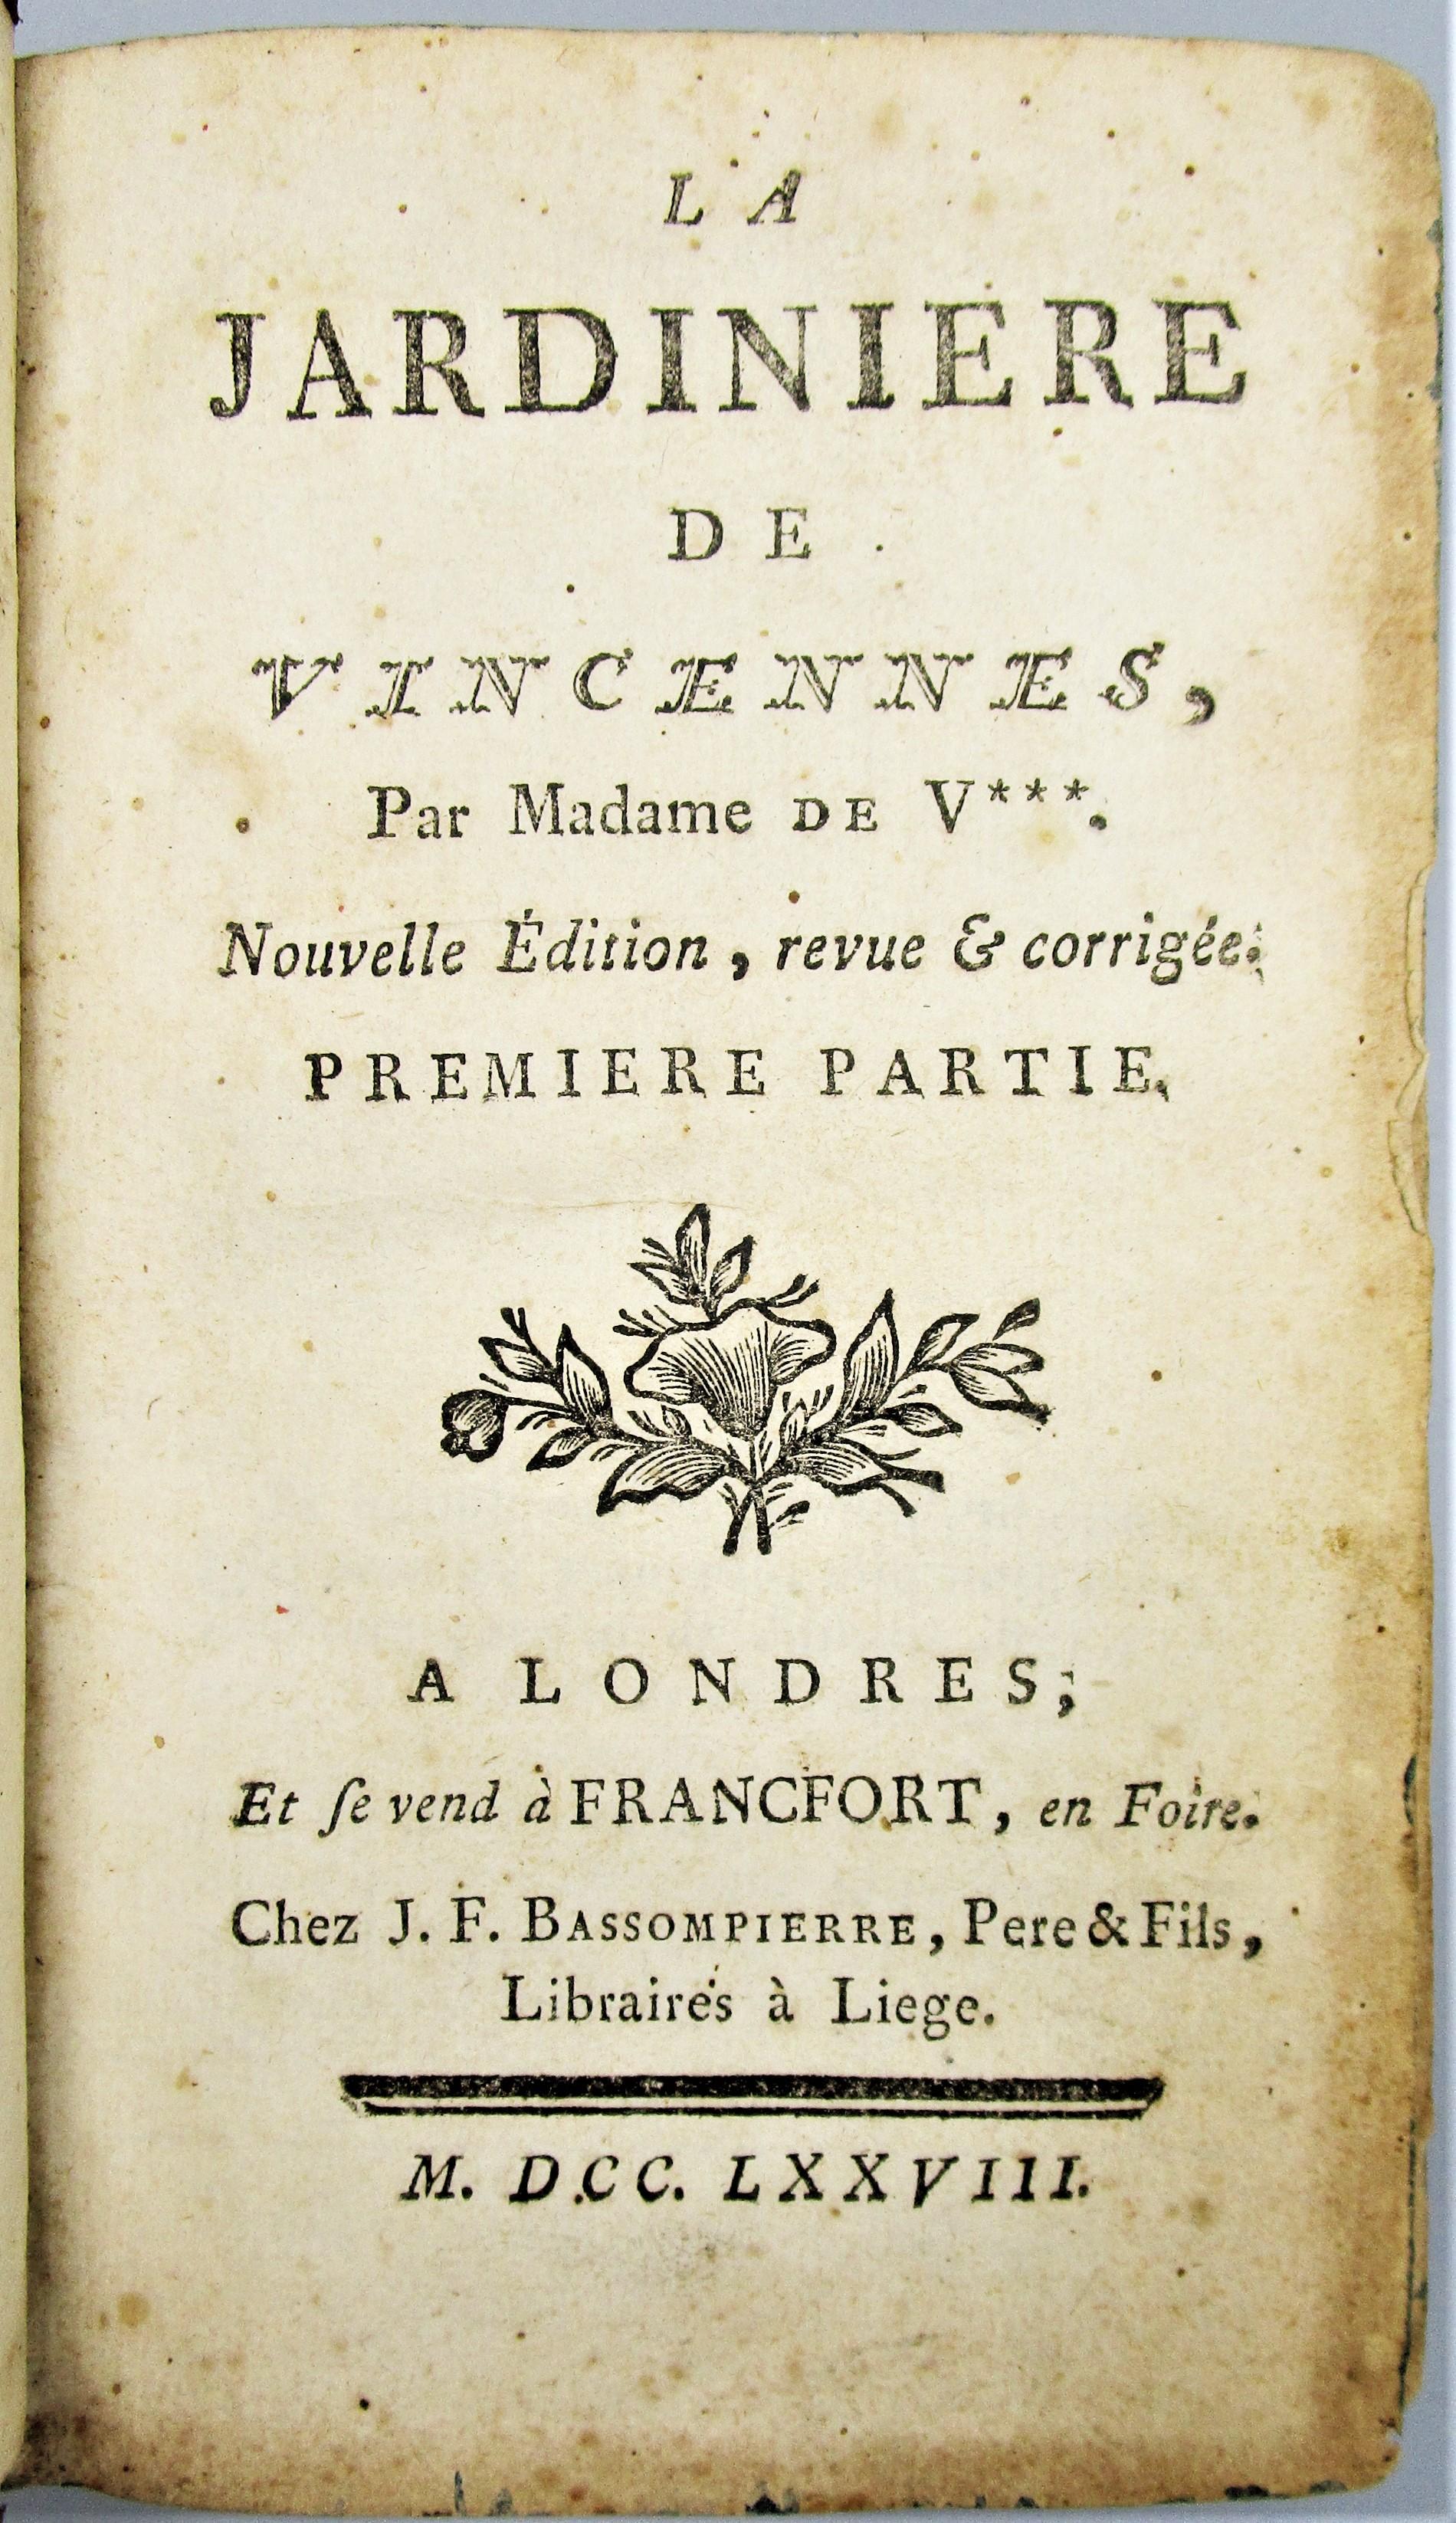 LA JARDINIERE DE VINCENNES, by Madame de Villeneuve - 1778 [2 Vols]